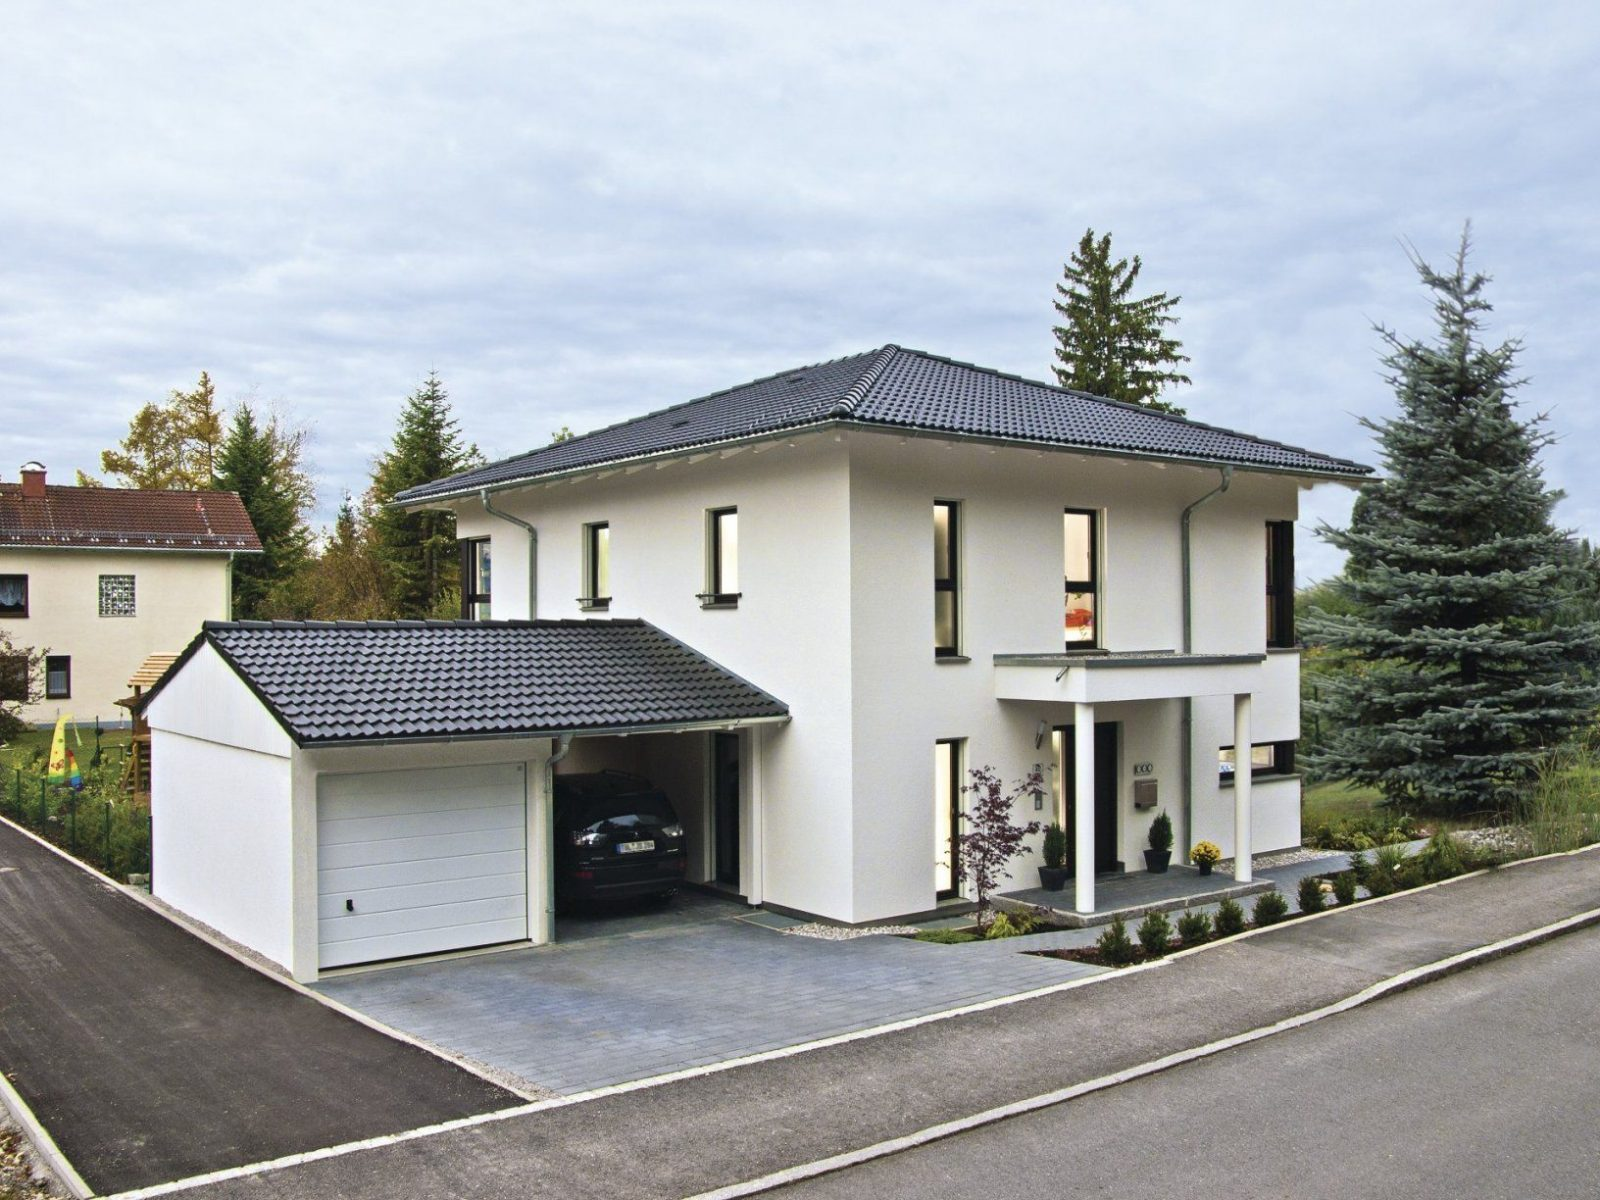 Weber Haus Faszinierend Dekoration Oben Weber Haus Haus Citylife von Weber Haus City Life Bild